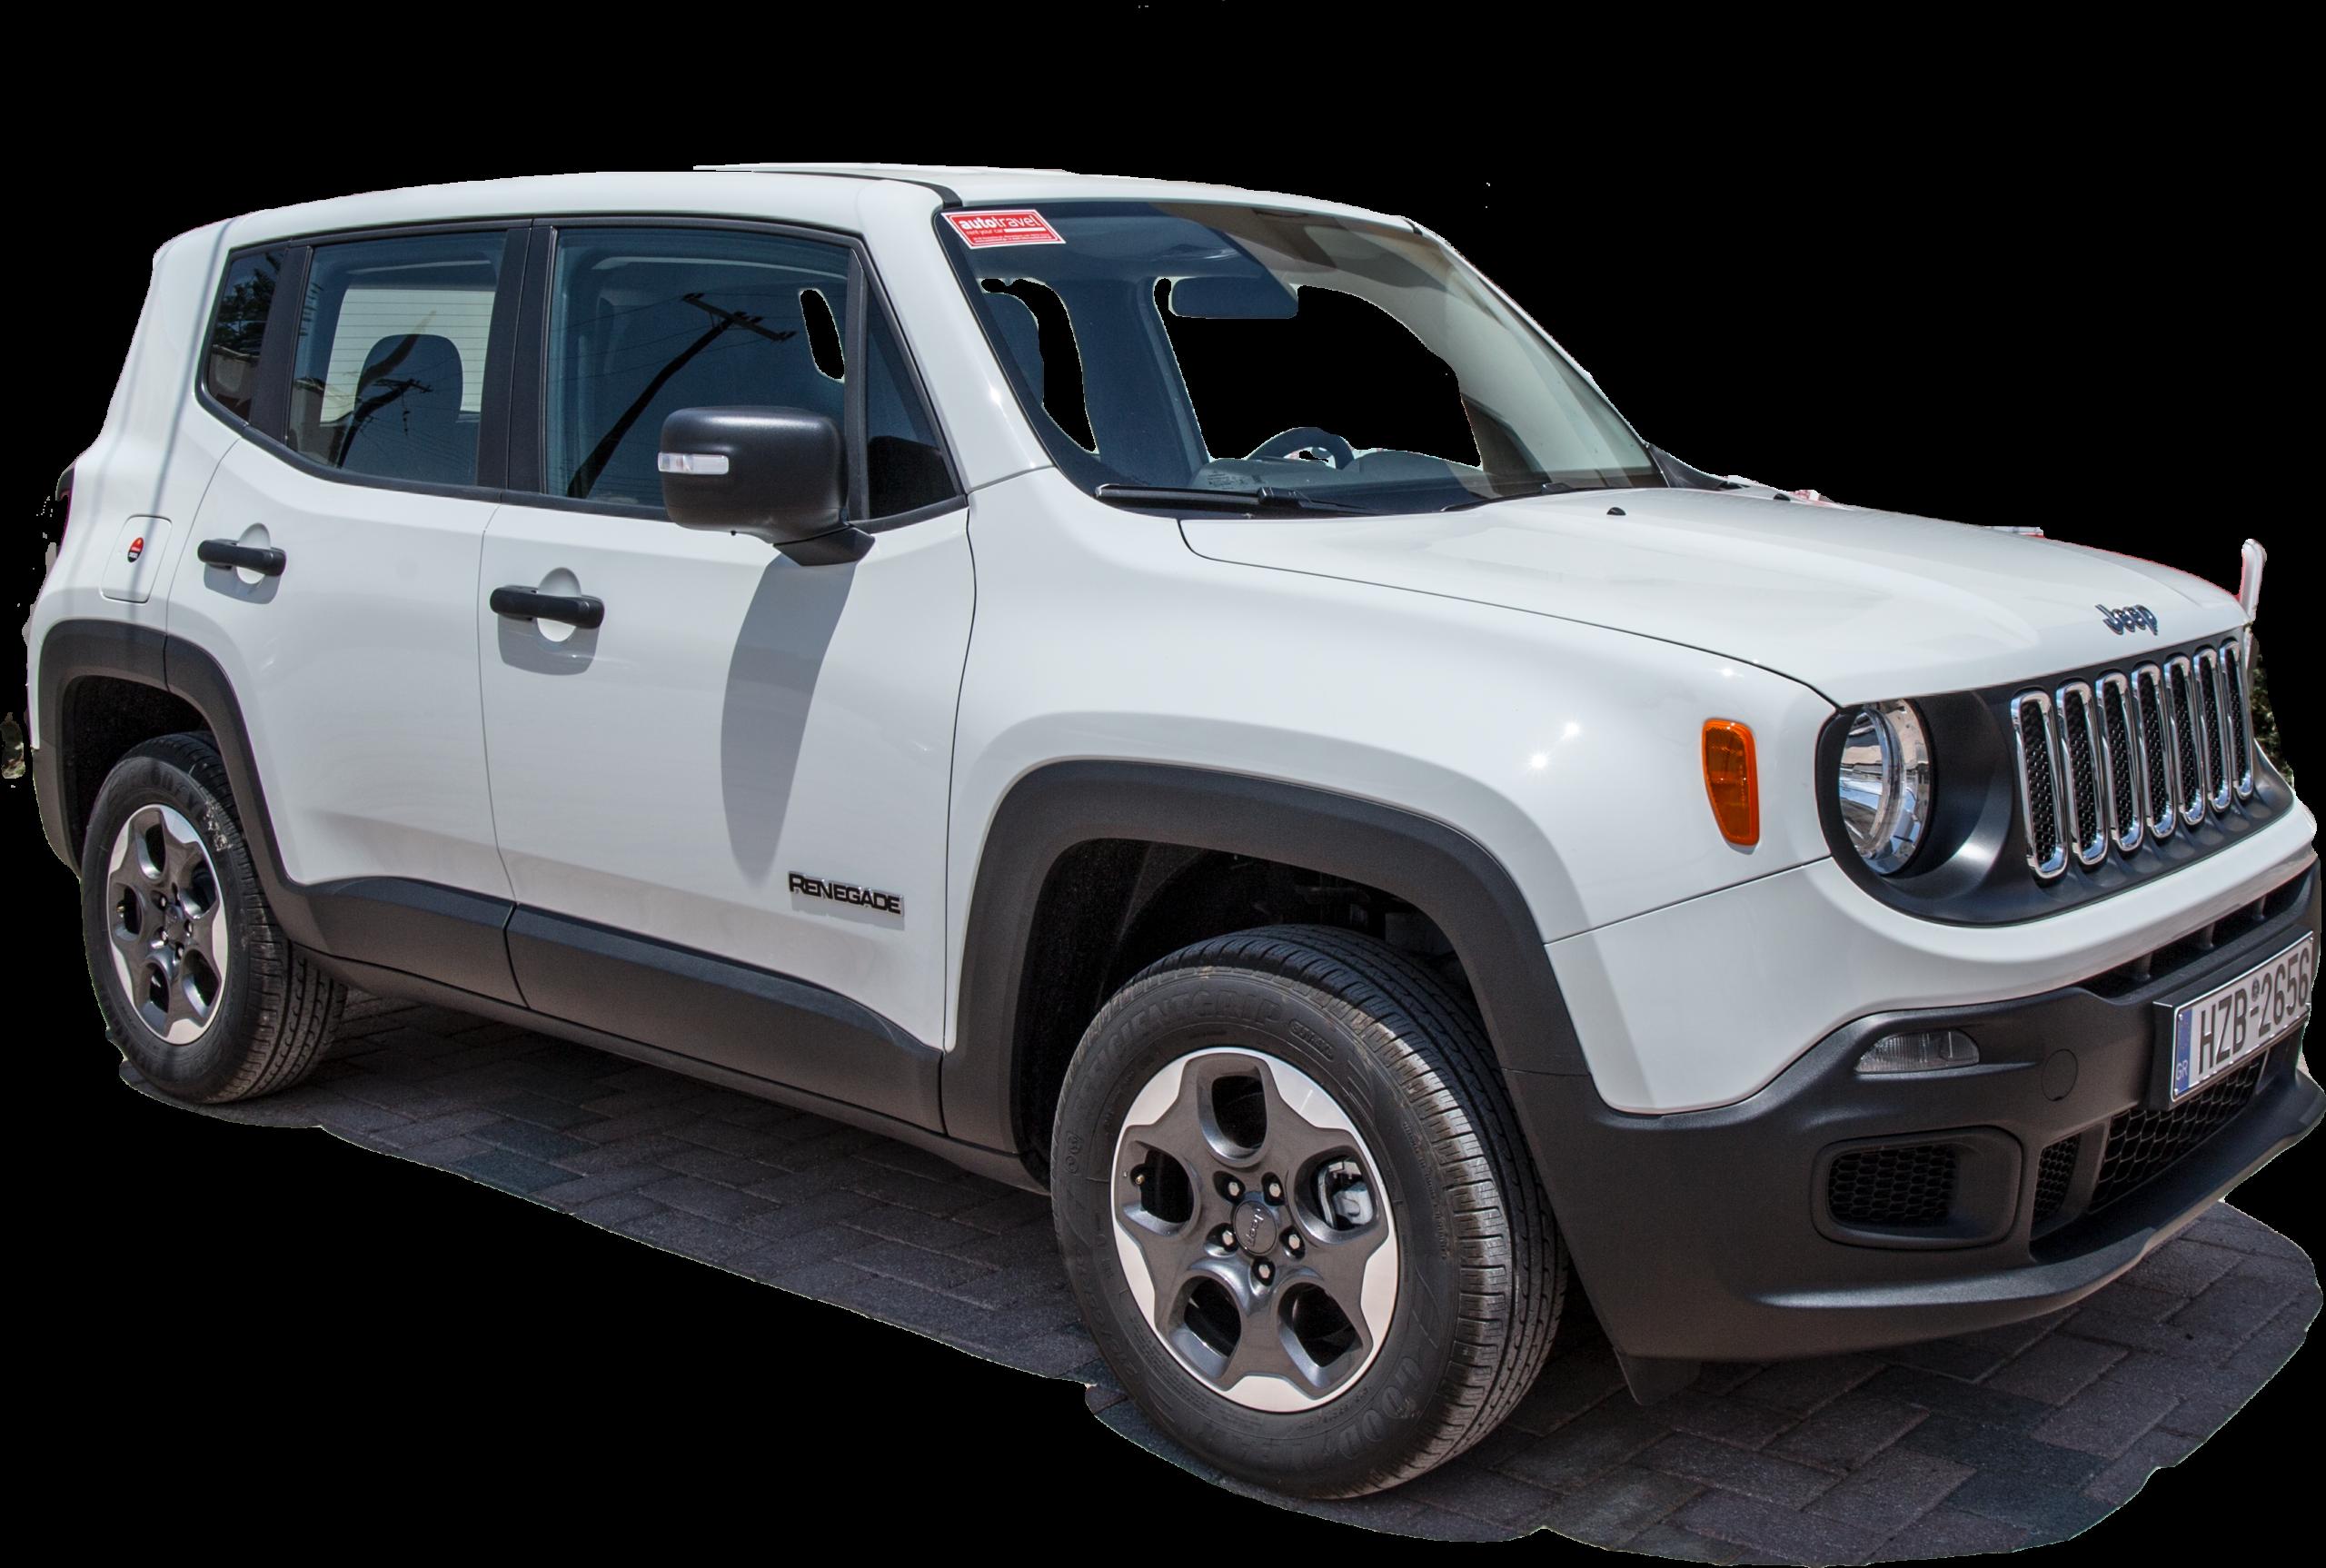 Jeep Renagade 4x4 turbo Diesel